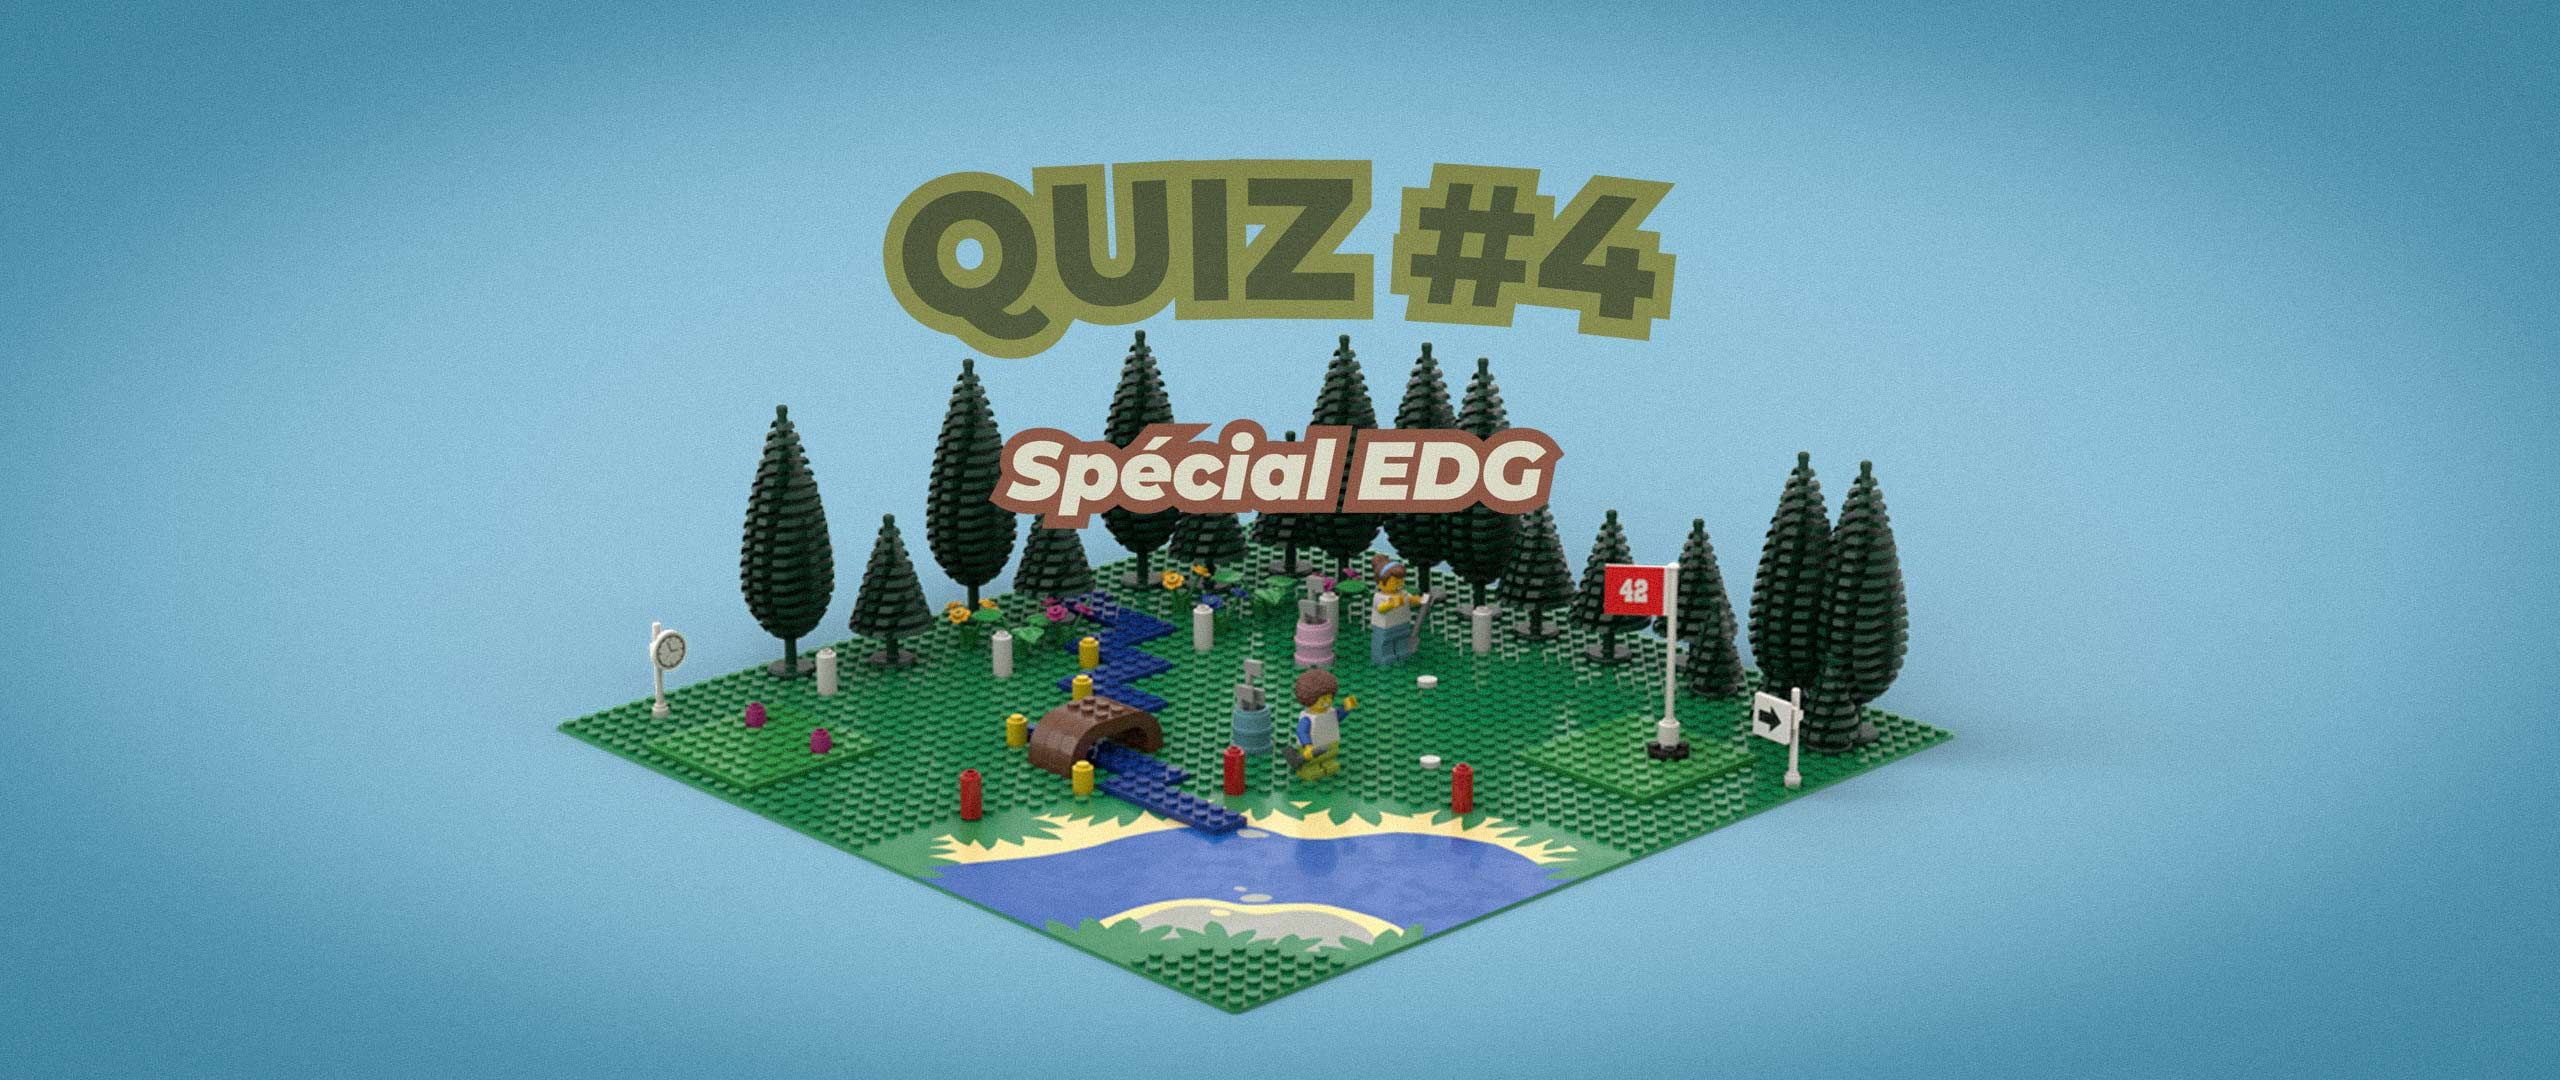 Golf O Quizz Edg 2021 Quiz 4 Header